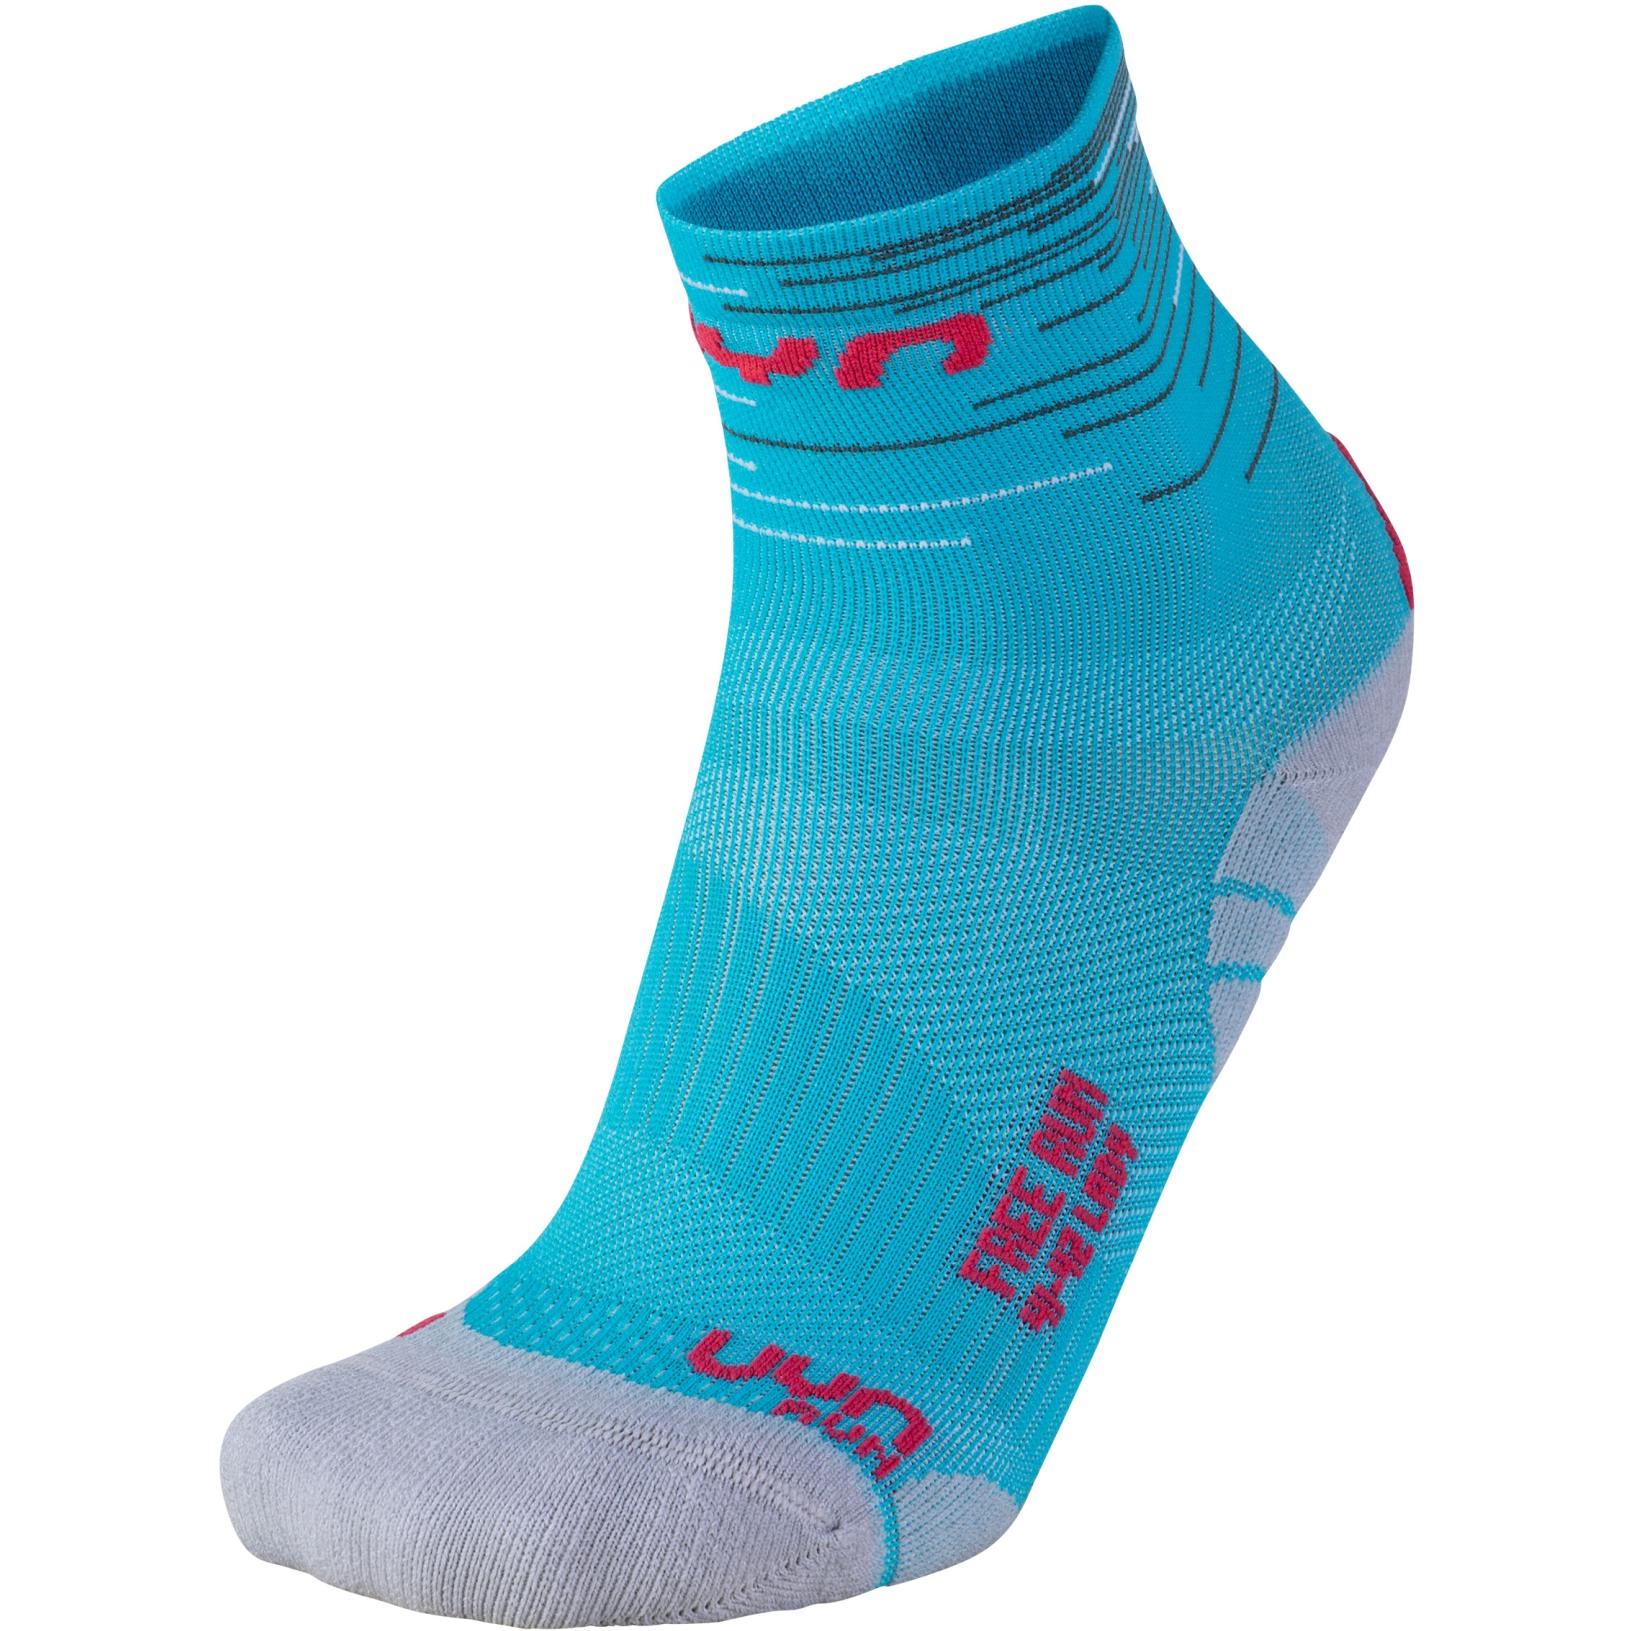 UYN Free Run Socken Damen - Turquoise/Coral